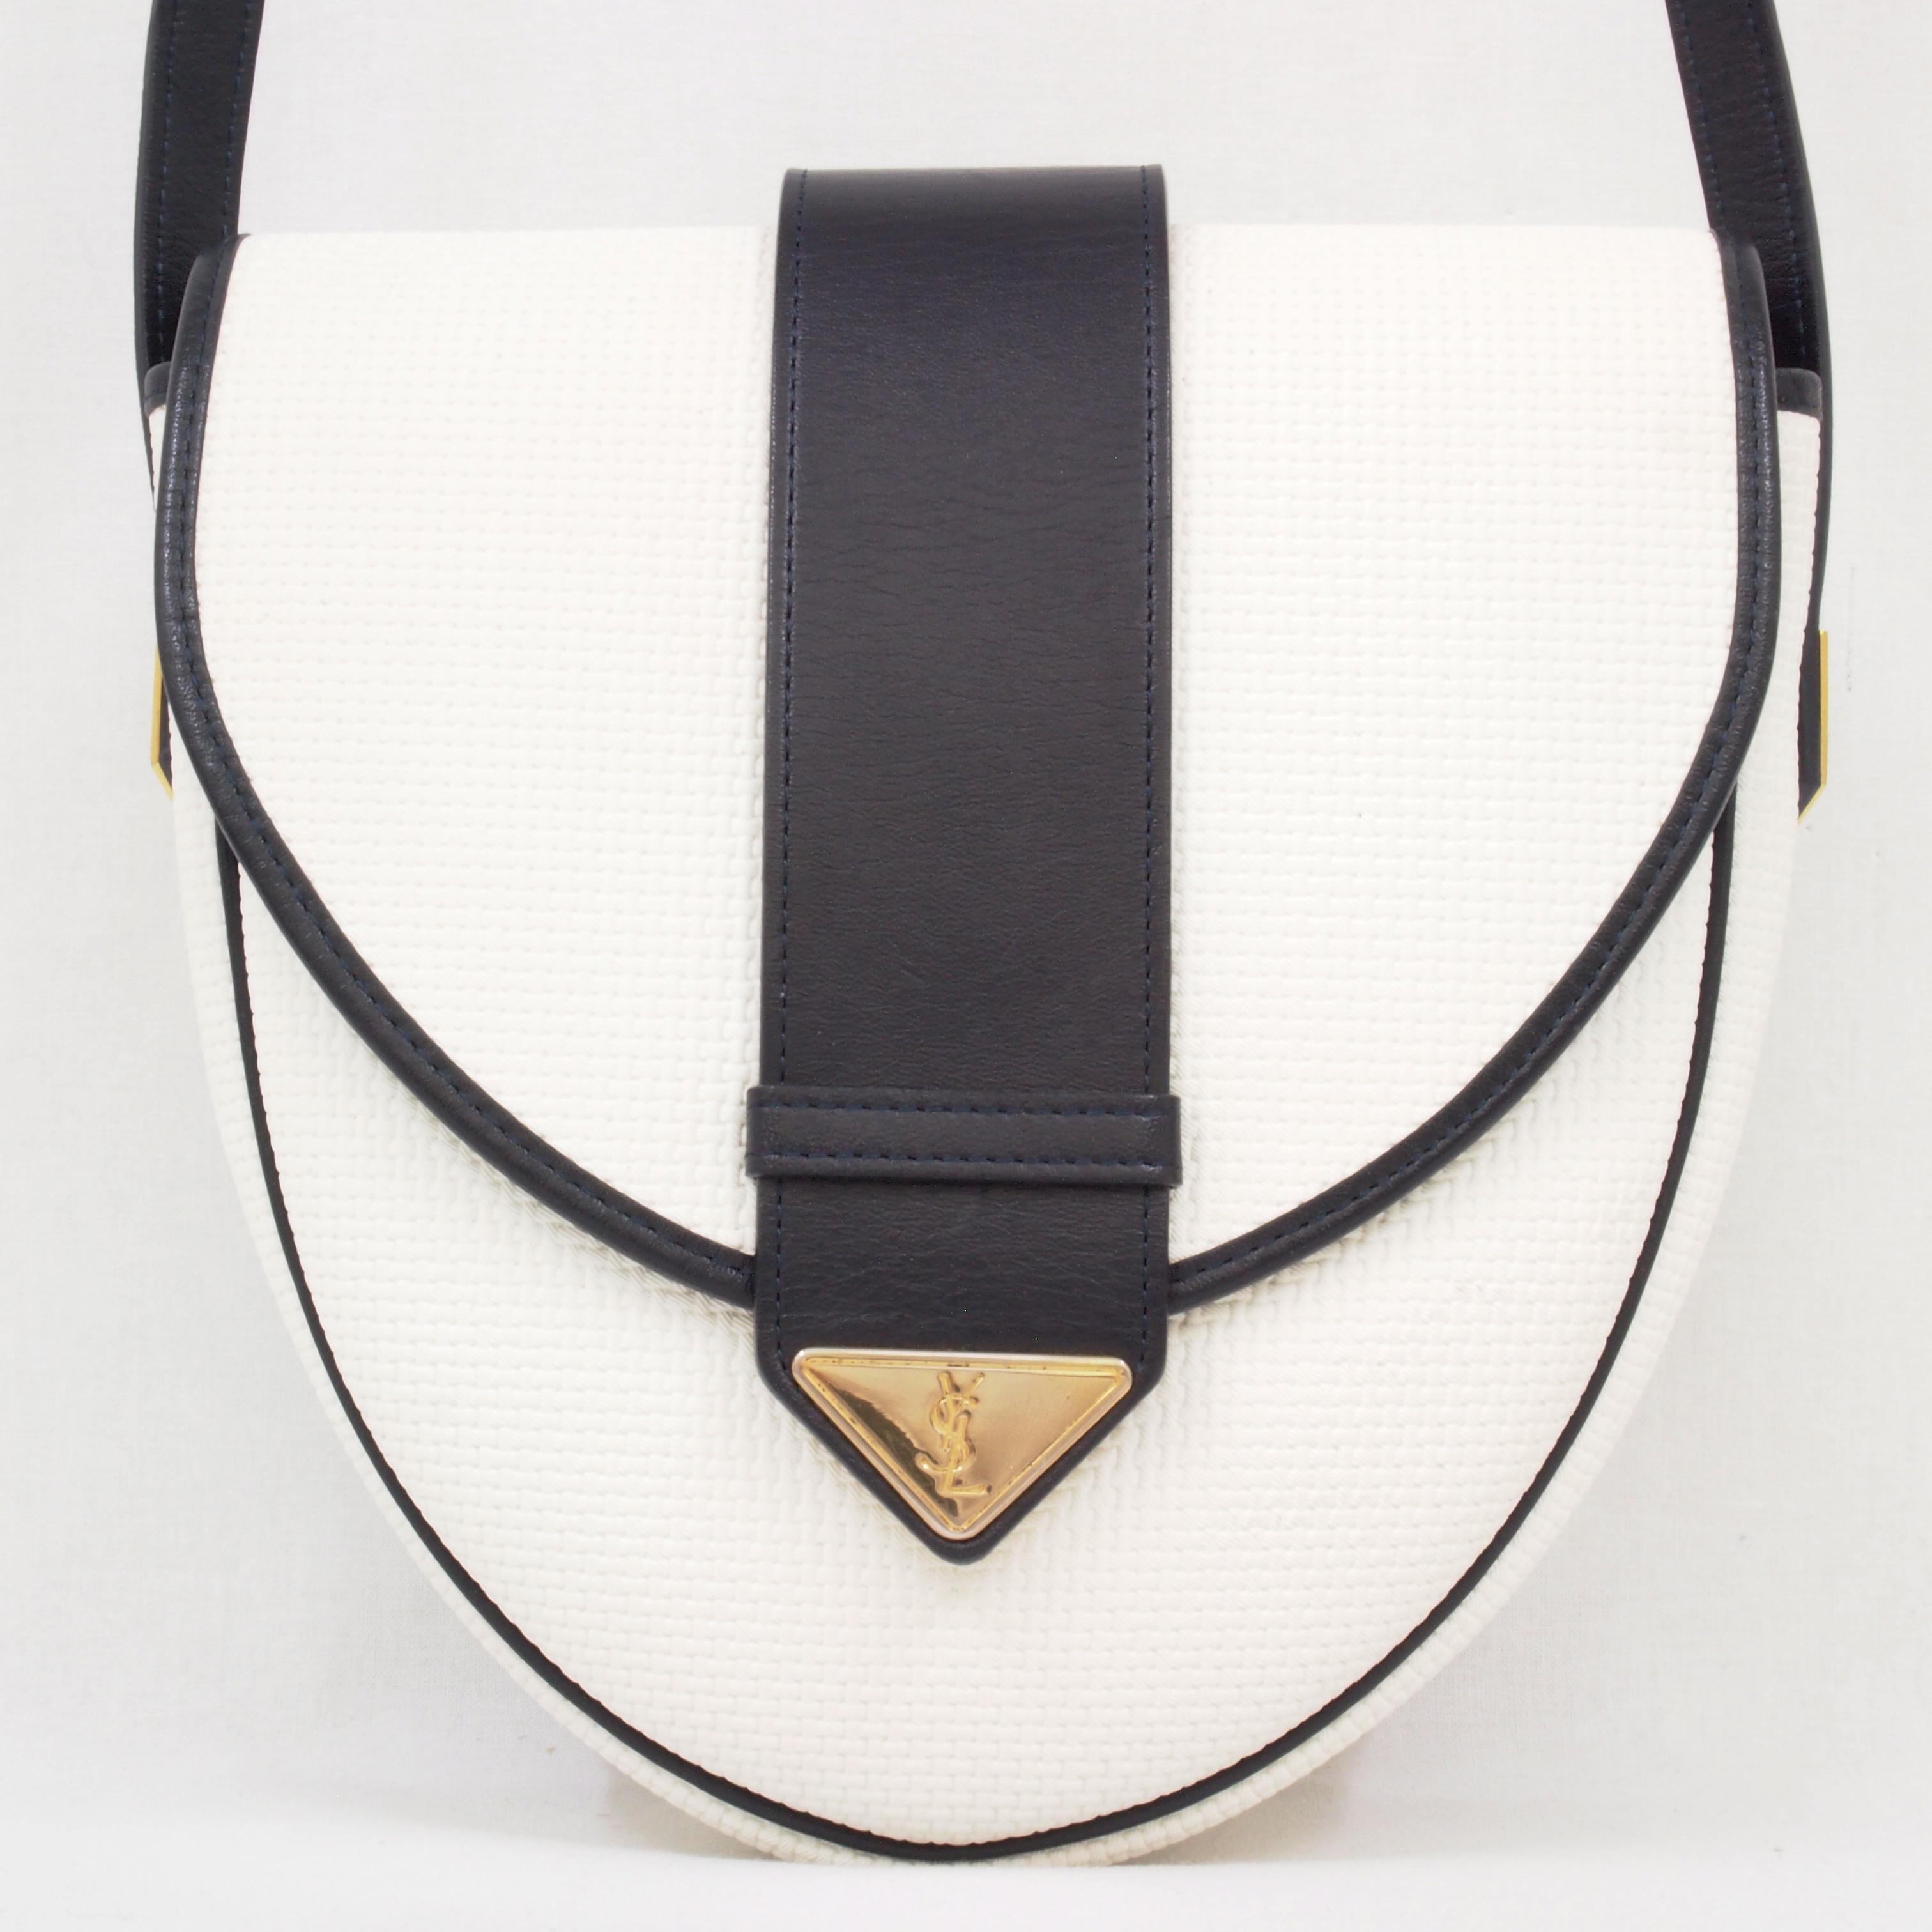 Vintage Yves Saint Laurent Woven Y Flap YSL Shoulder Bag Excellent ...